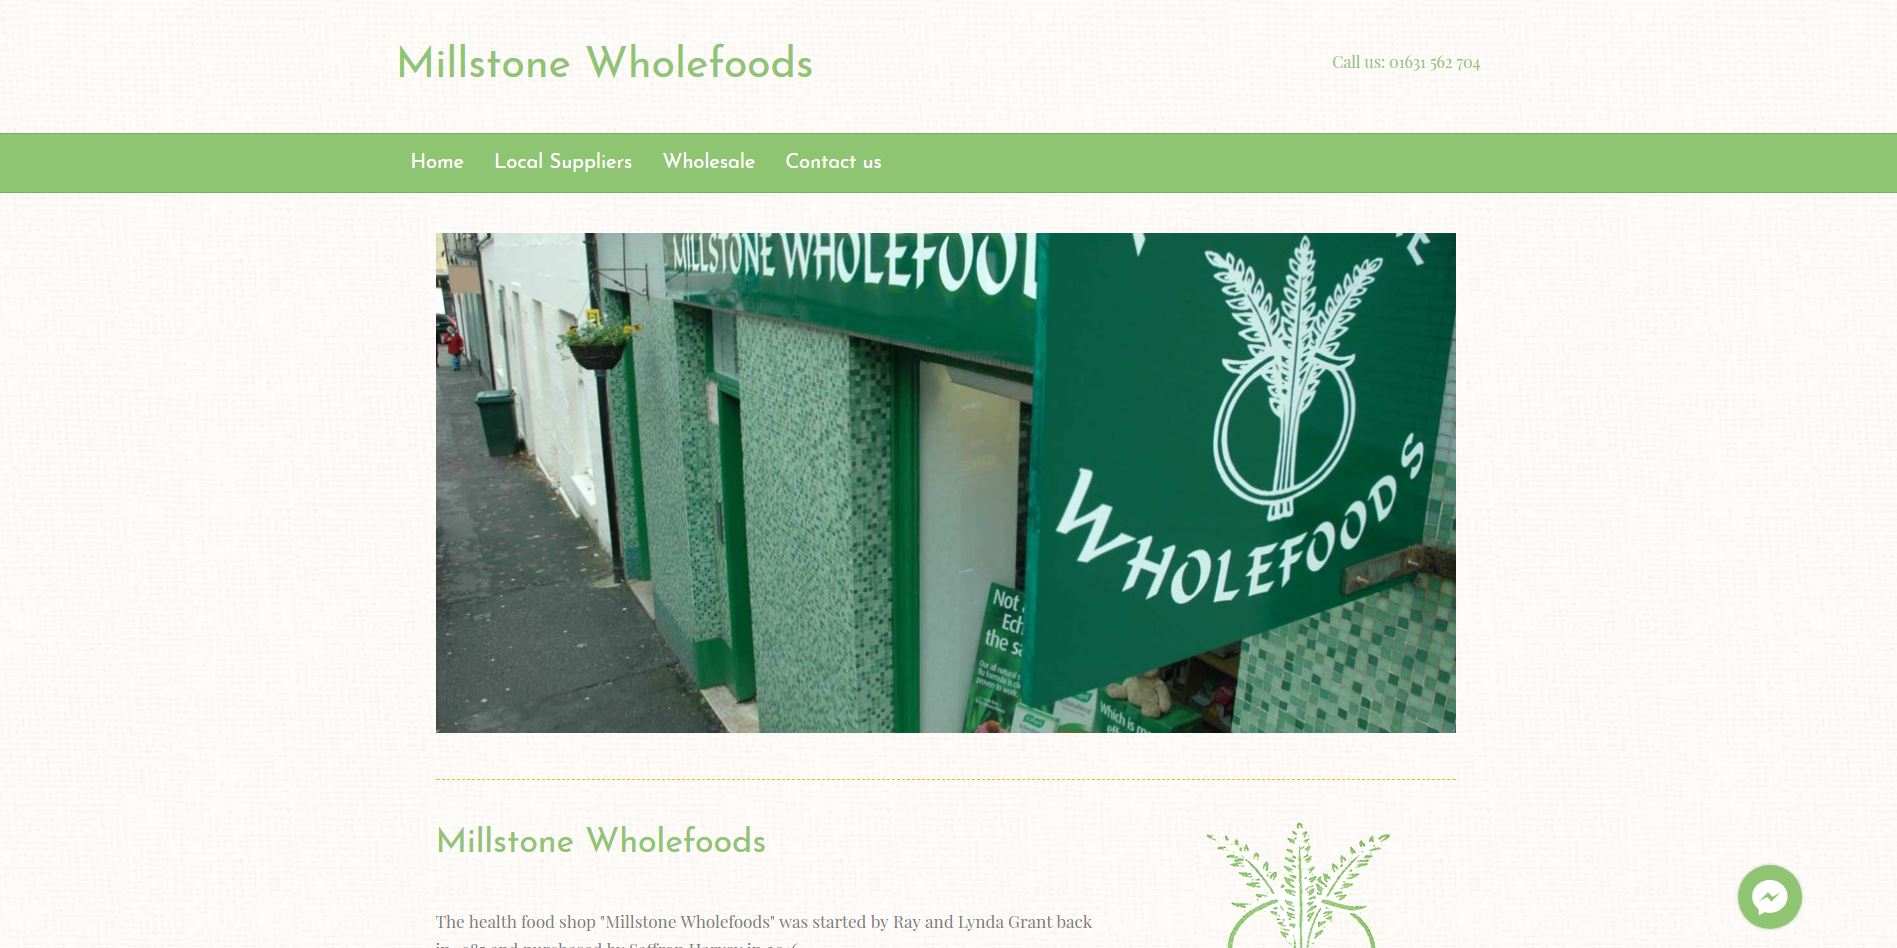 Millstone Wholefoods website